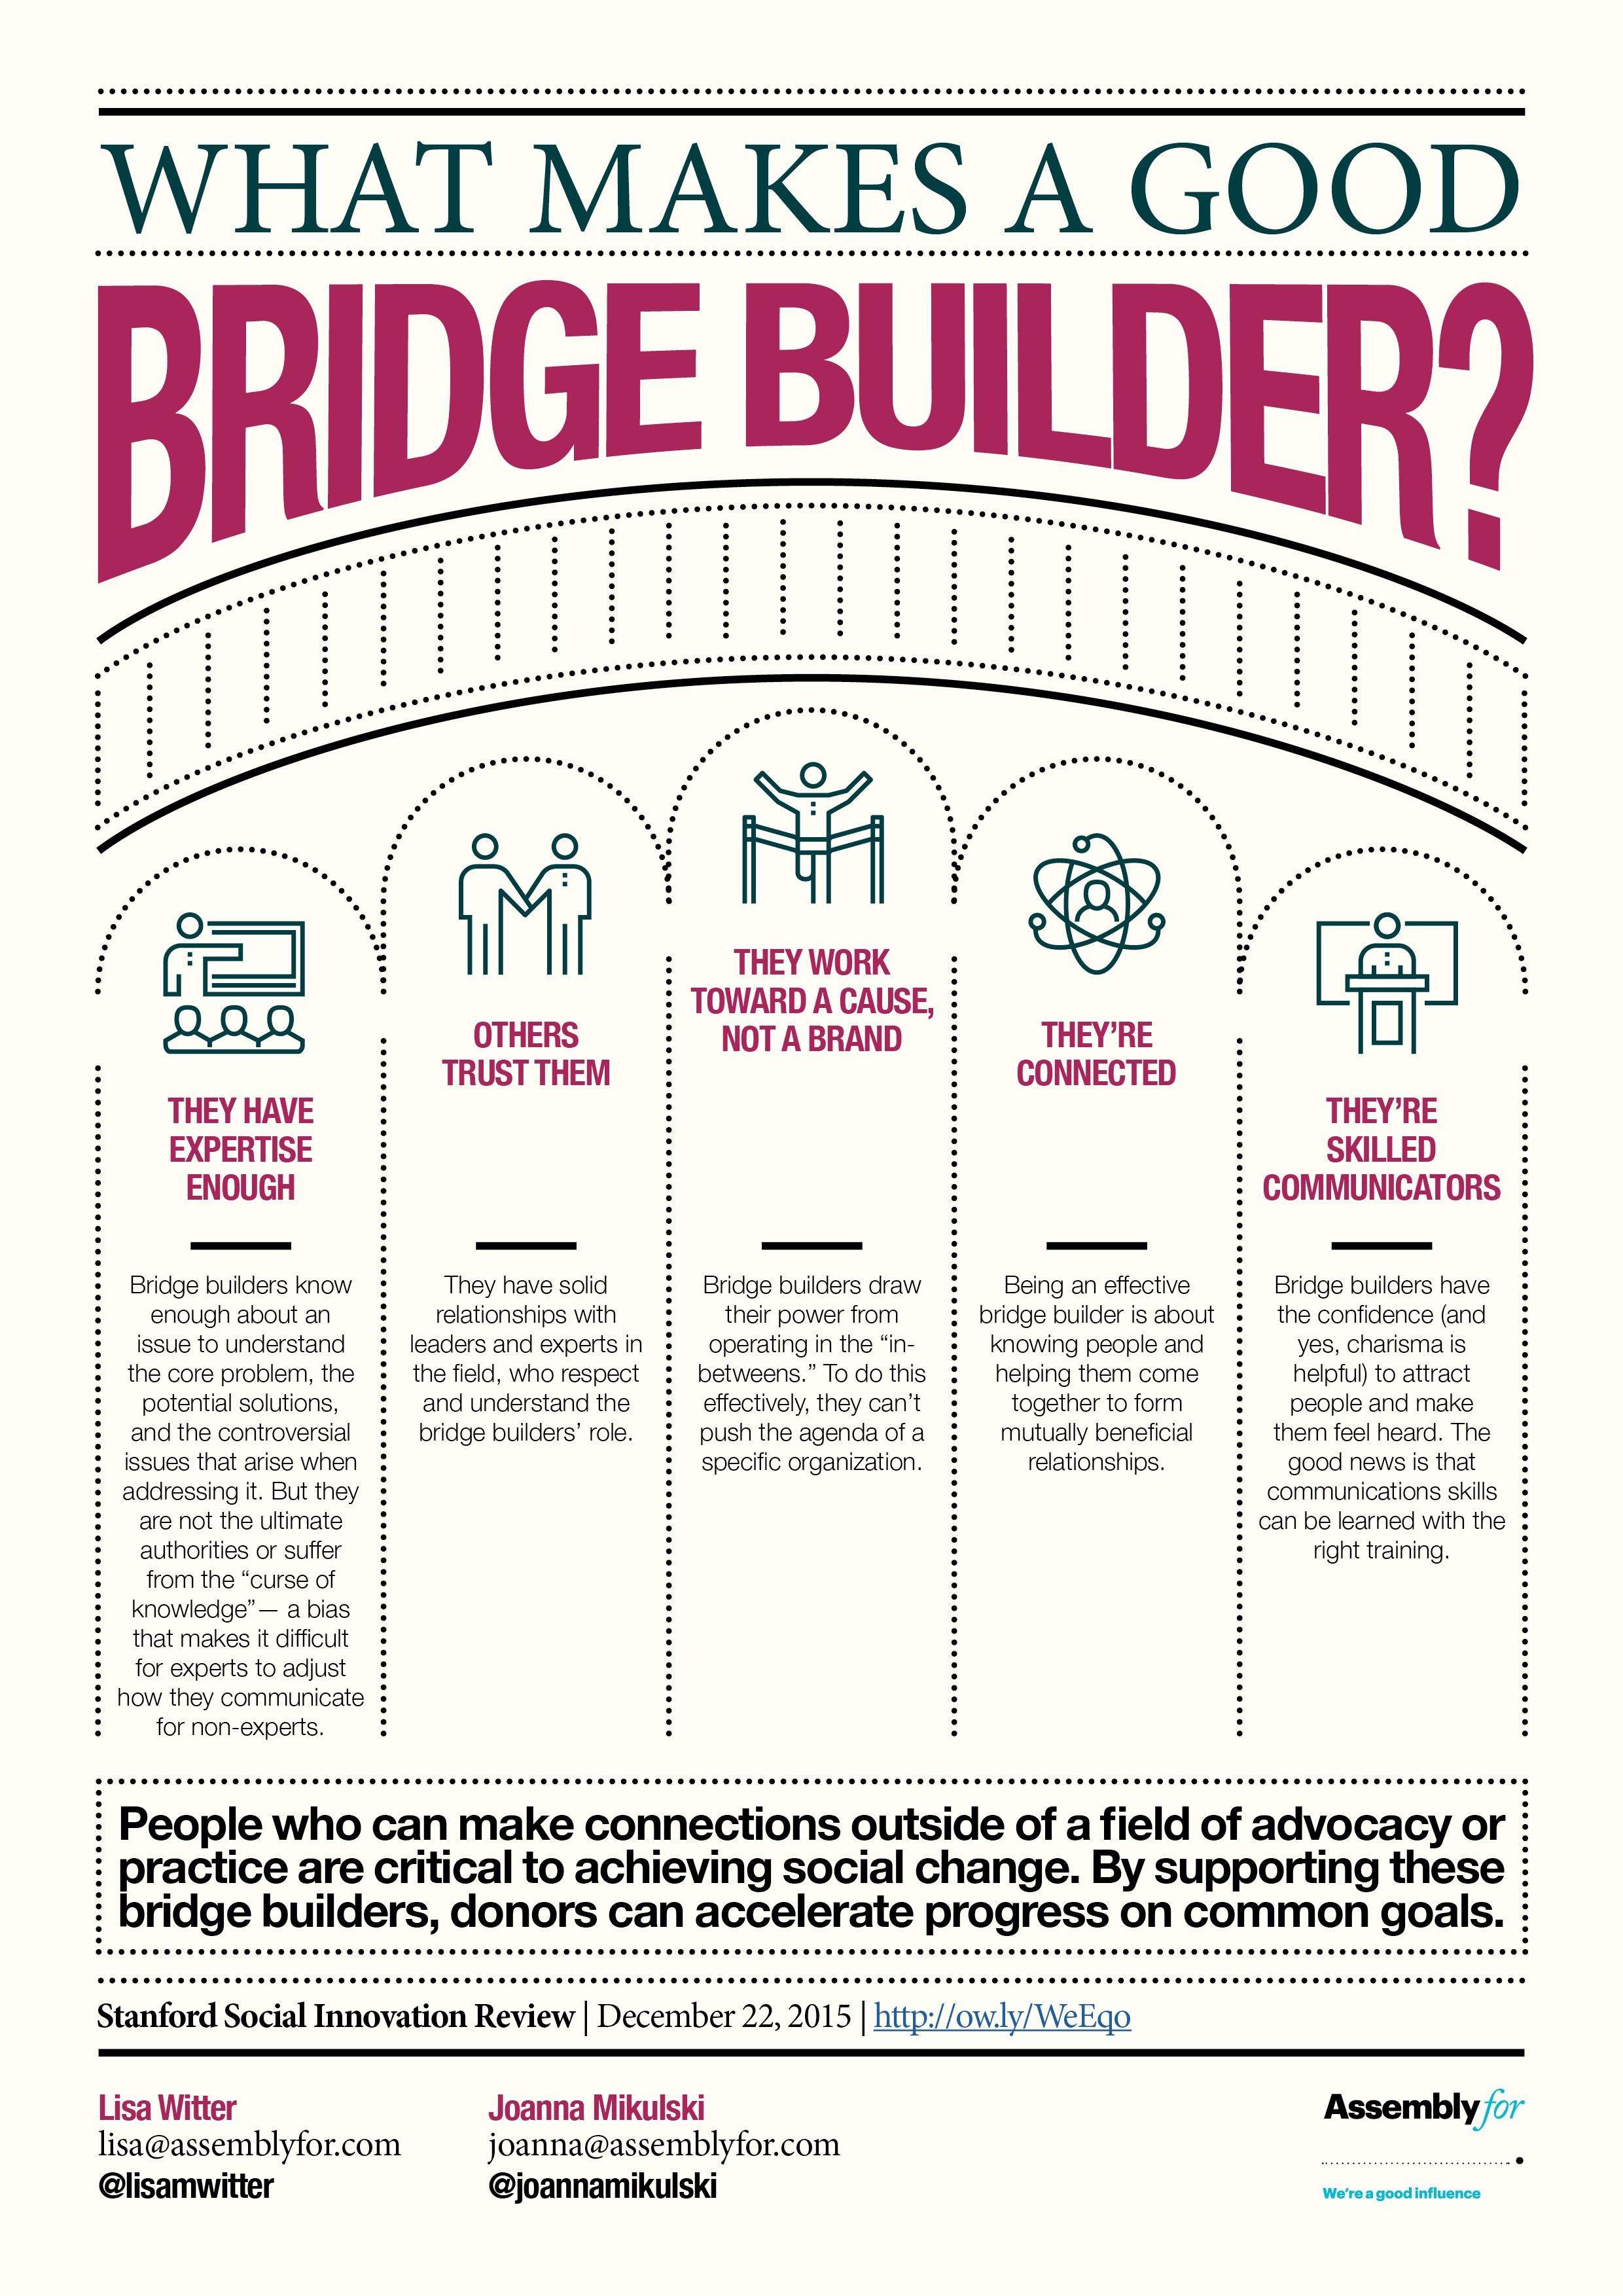 BridgeBuilder_infographic_FINAL.jpg